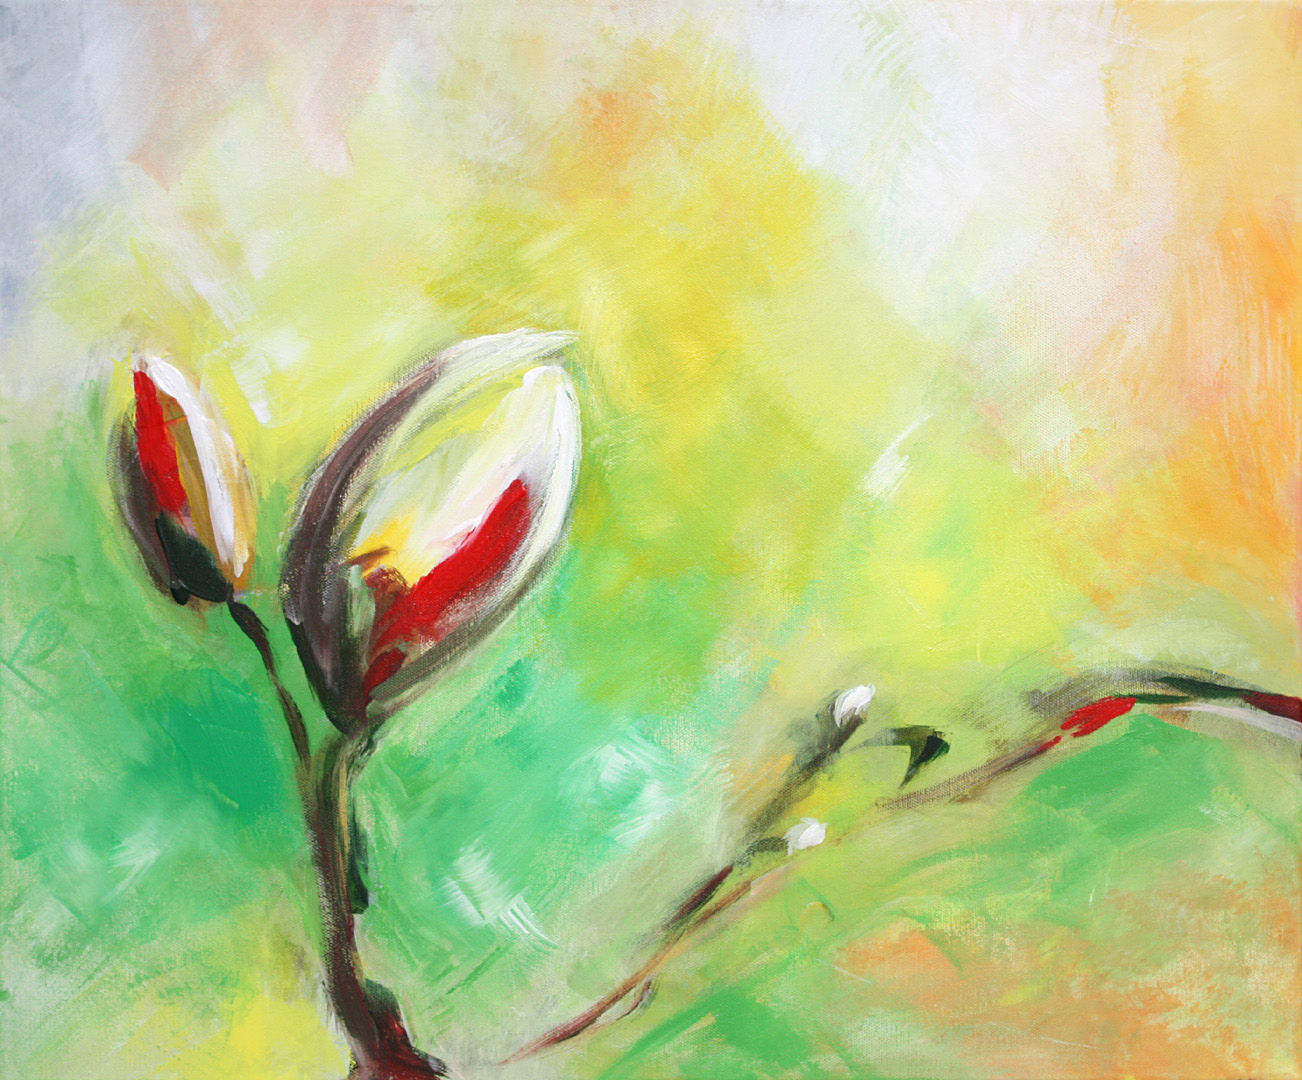 Merle Neumann malt – Bildmotiv: Neues Leben